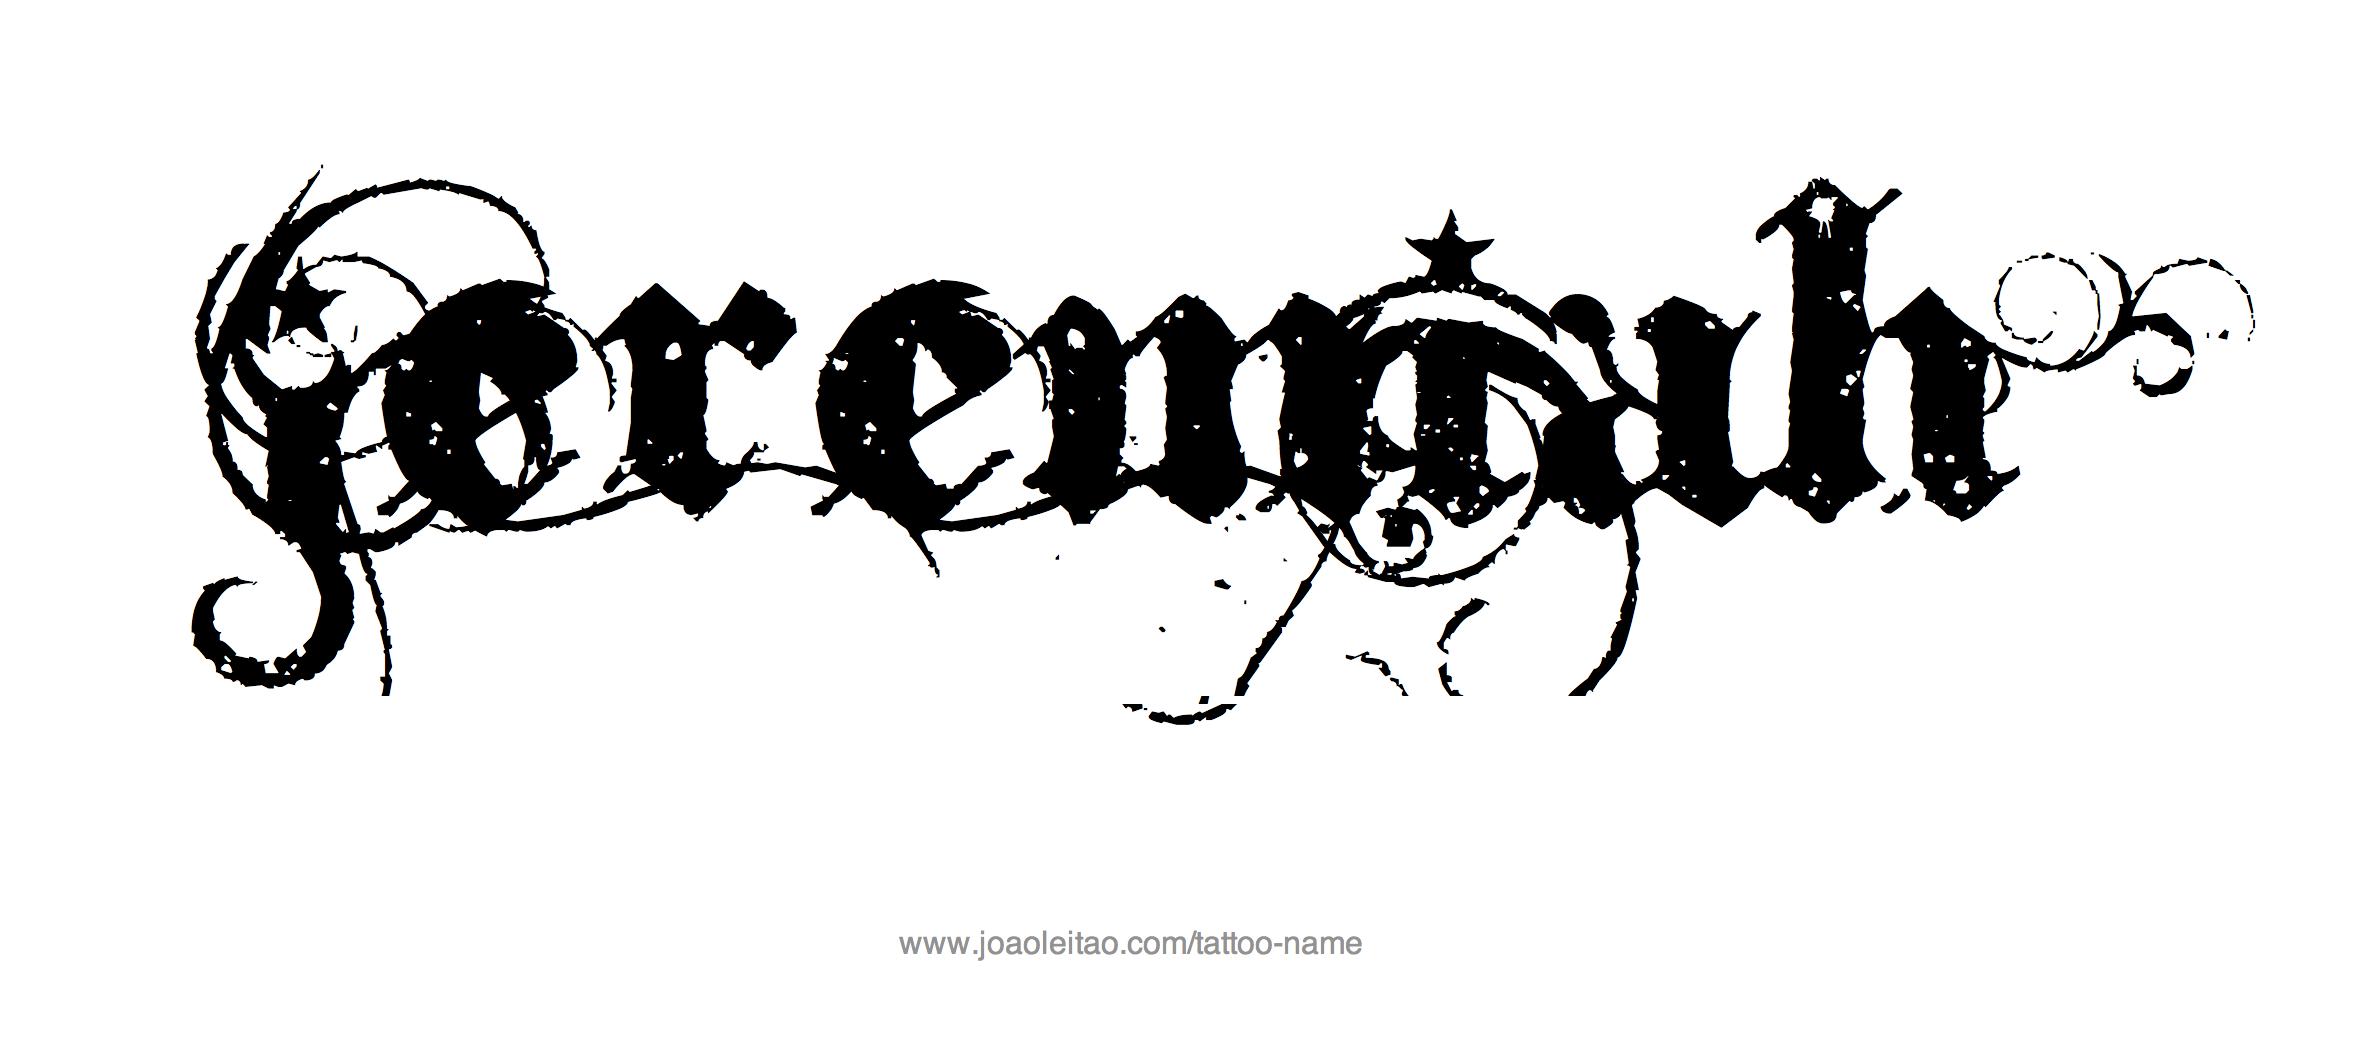 jeremiah name tattoo designs. Black Bedroom Furniture Sets. Home Design Ideas